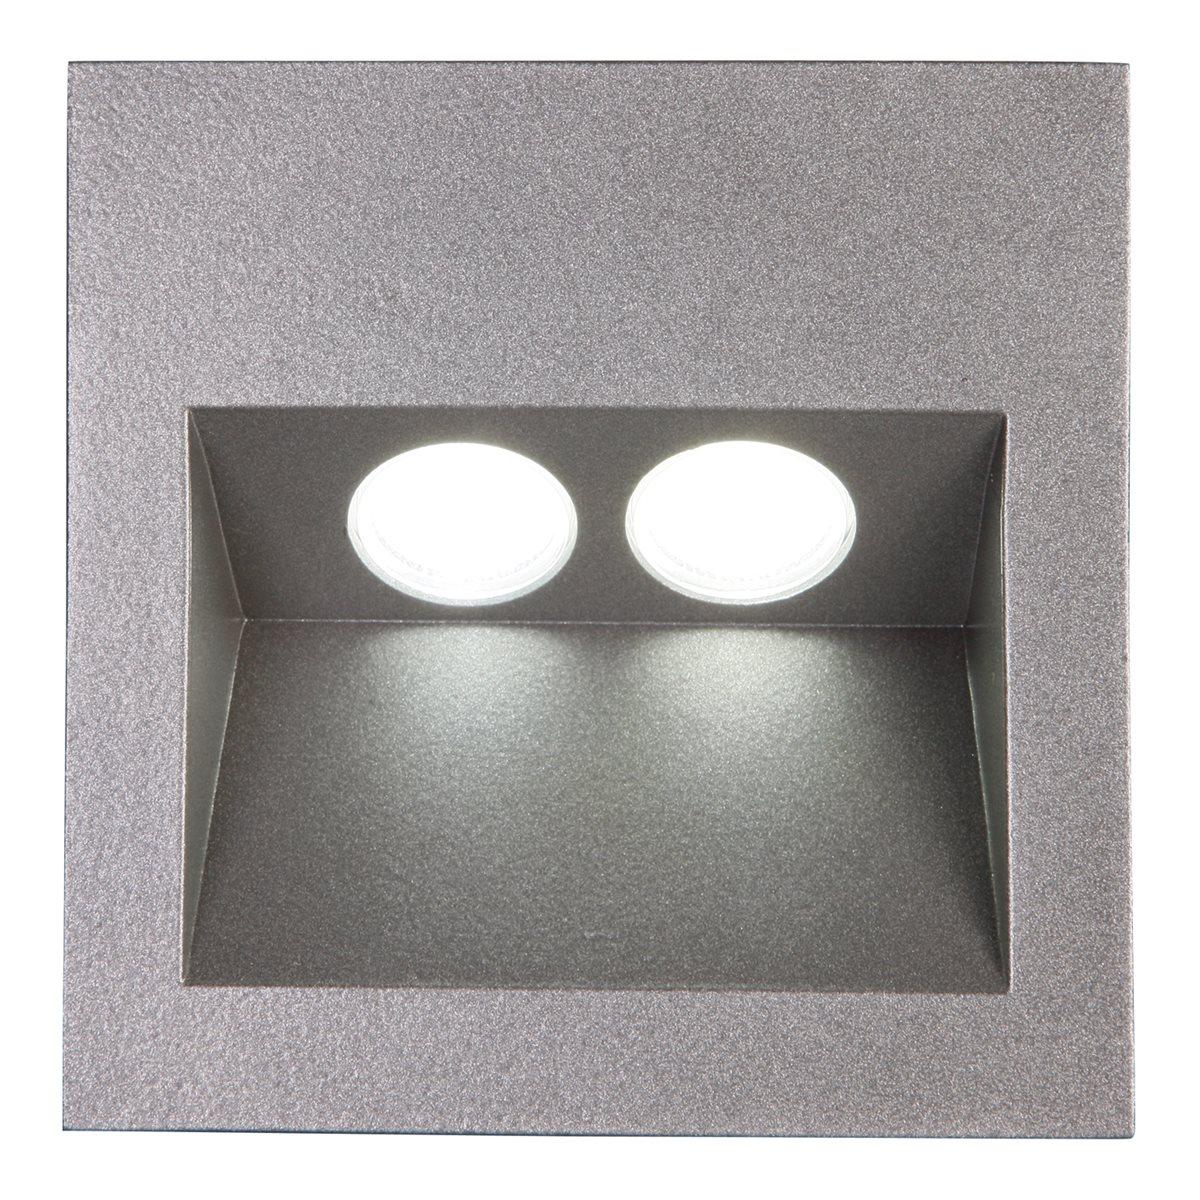 lampenlux led einbaustrahler aussenleuchte taimy ip65 230v spot eckig aluminium down 2345 15. Black Bedroom Furniture Sets. Home Design Ideas